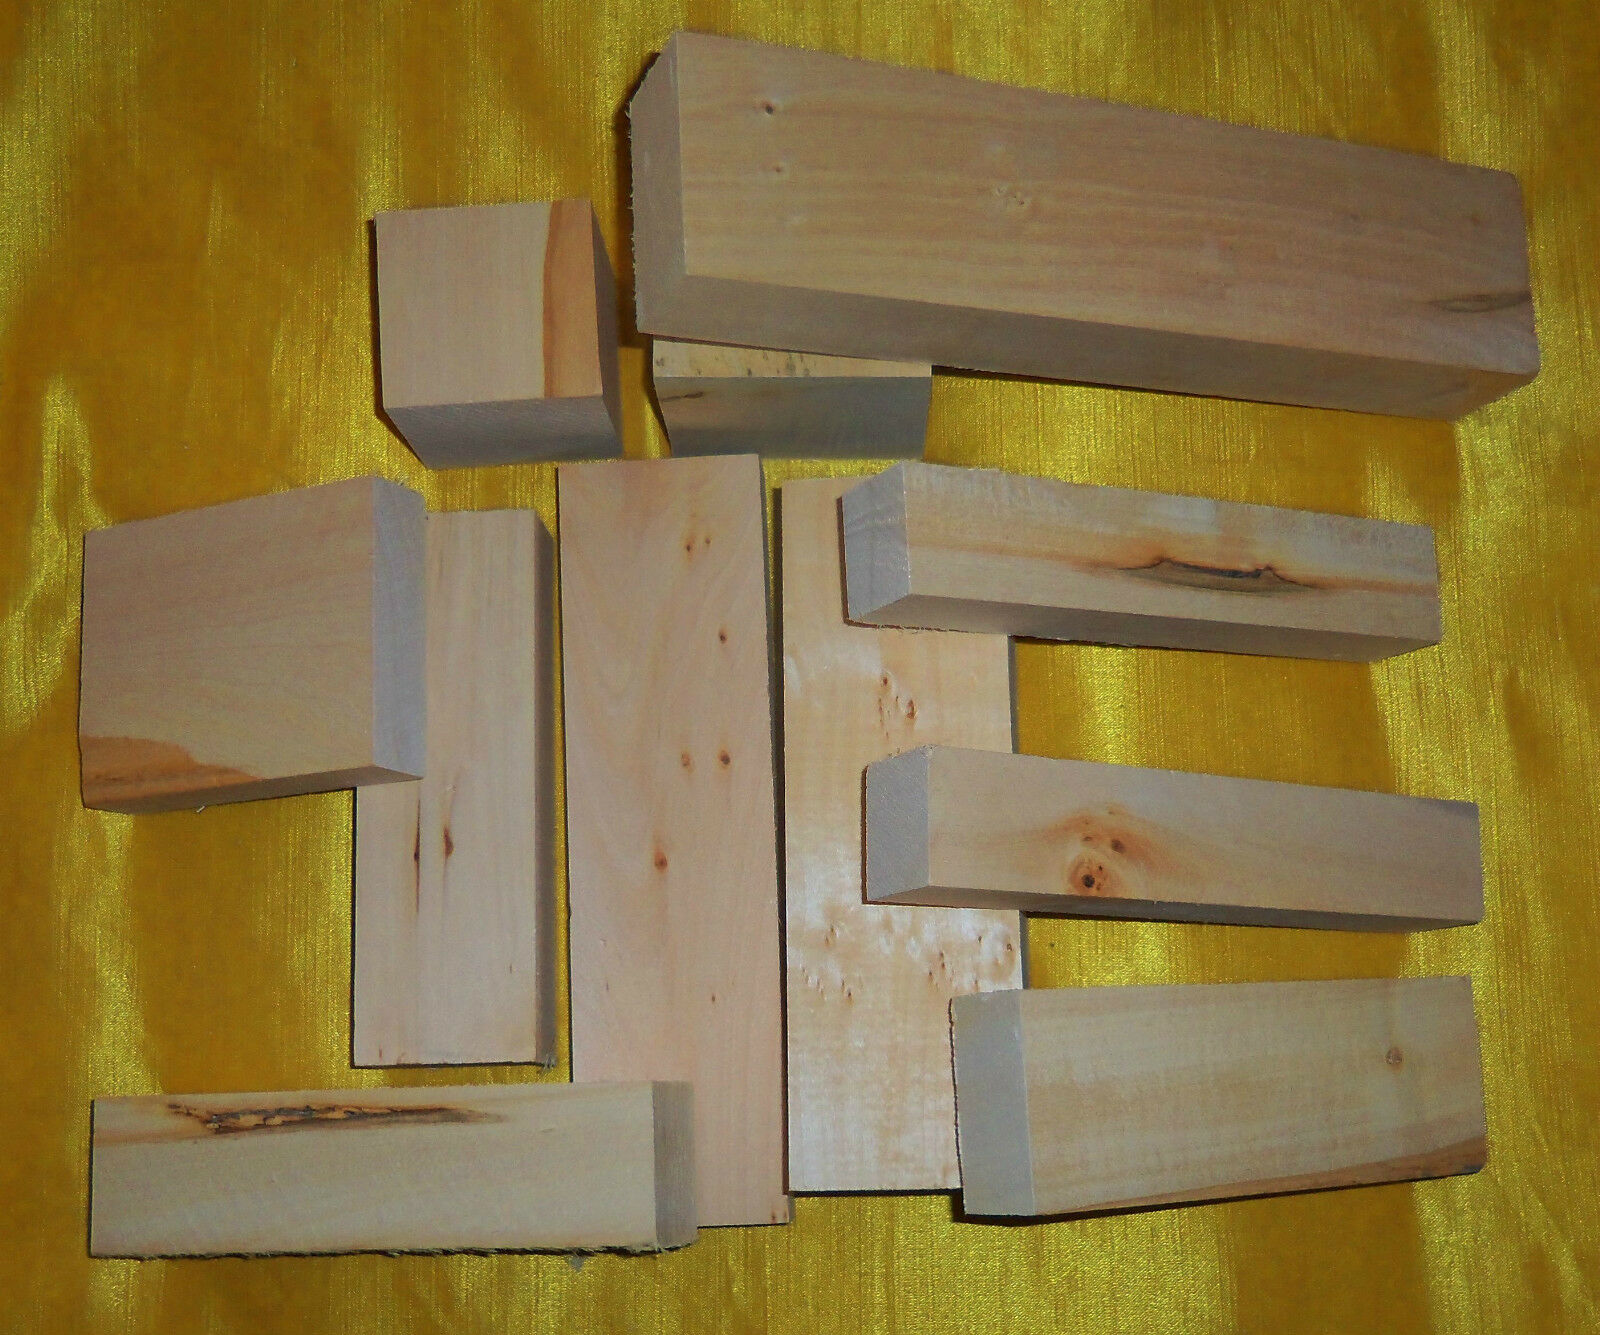 *Lindenholz, 3kg, Restholz, Linde, drechseln,schnitzen,Modellbau,Hobbyschnitzer*